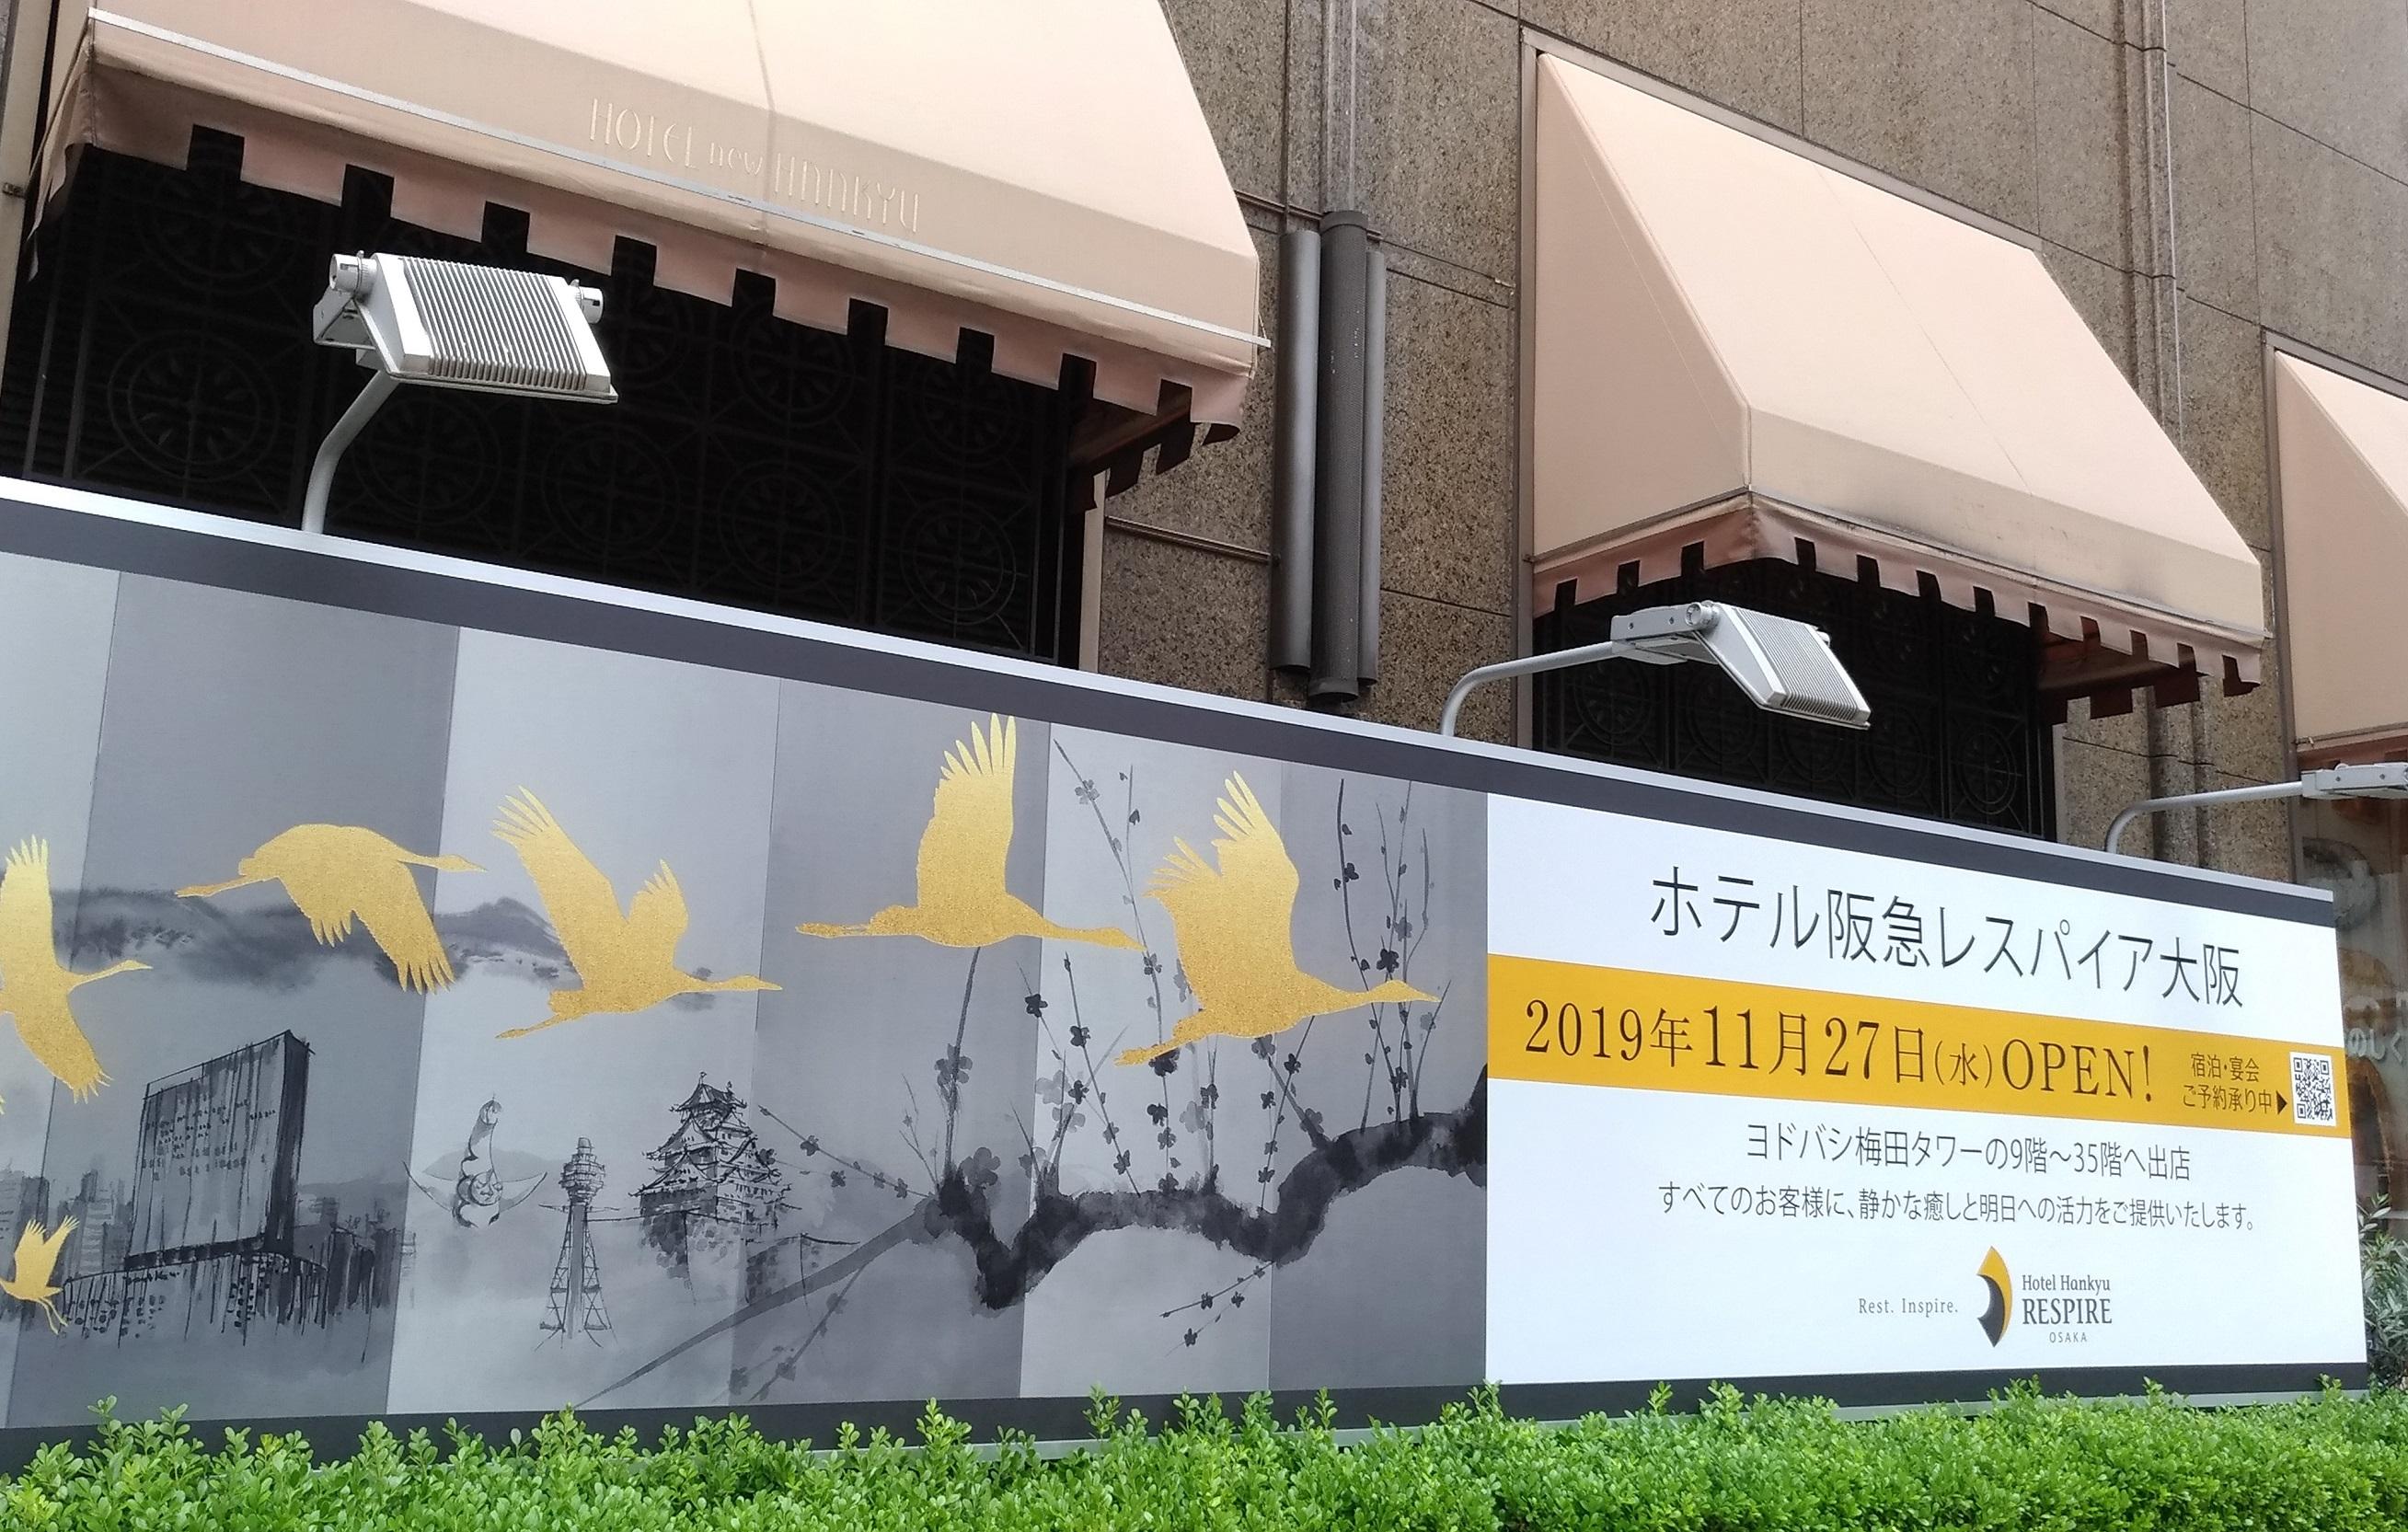 osaka_yodobashi_umeda_0706_1.jpg